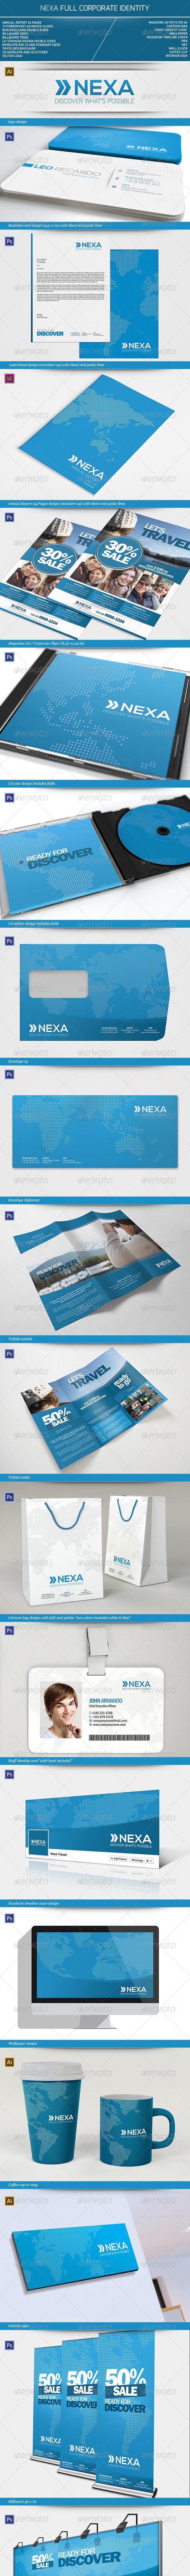 Nexa Full Corporate Identity - Stationery Print Templates